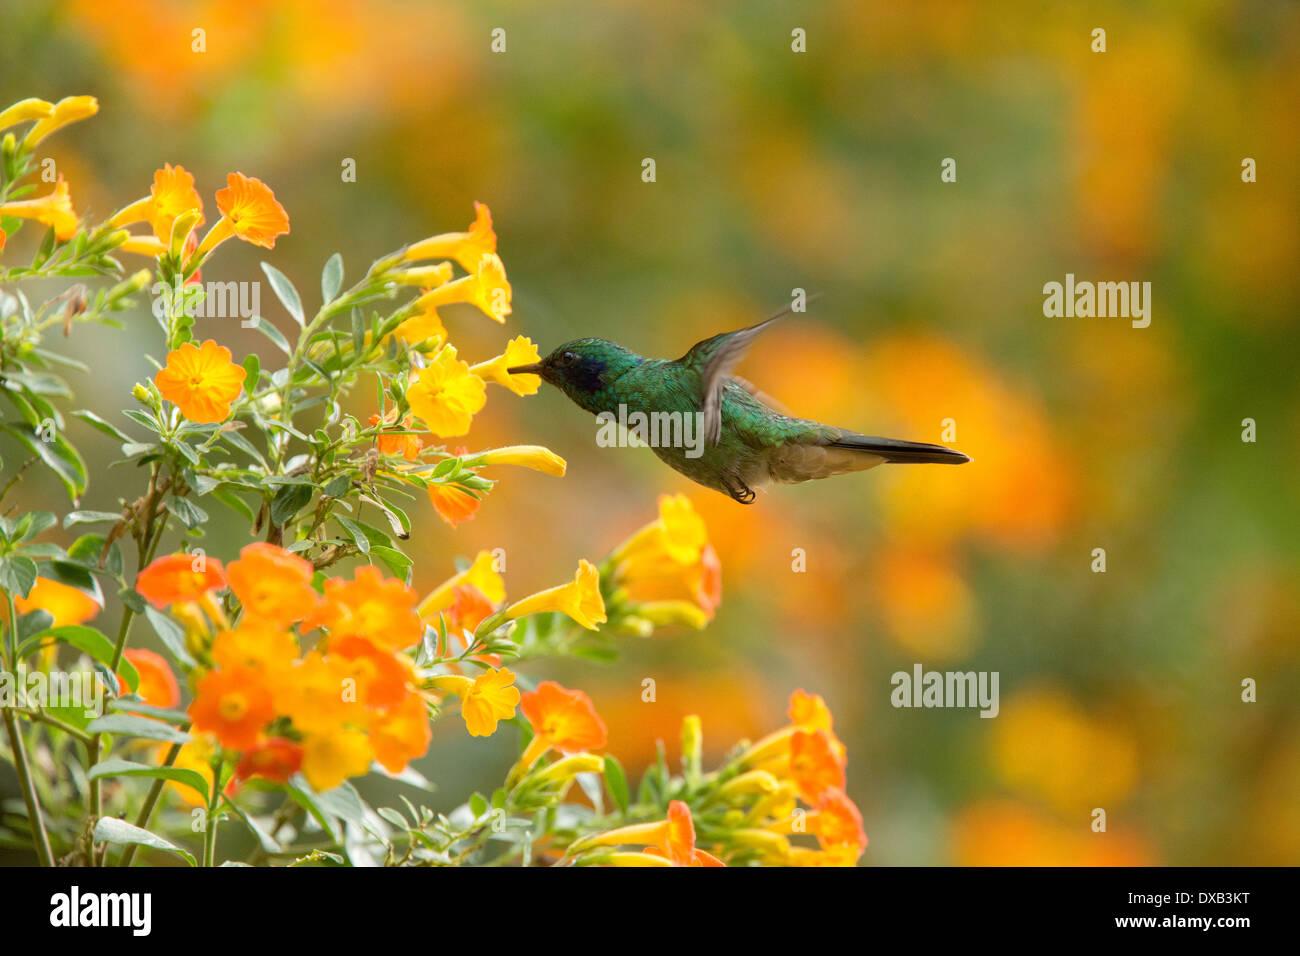 A Green Violetear hummingbird, (Colibri thallasinus) feeding on nectar from flowers Santa Marta Colombia. - Stock Image